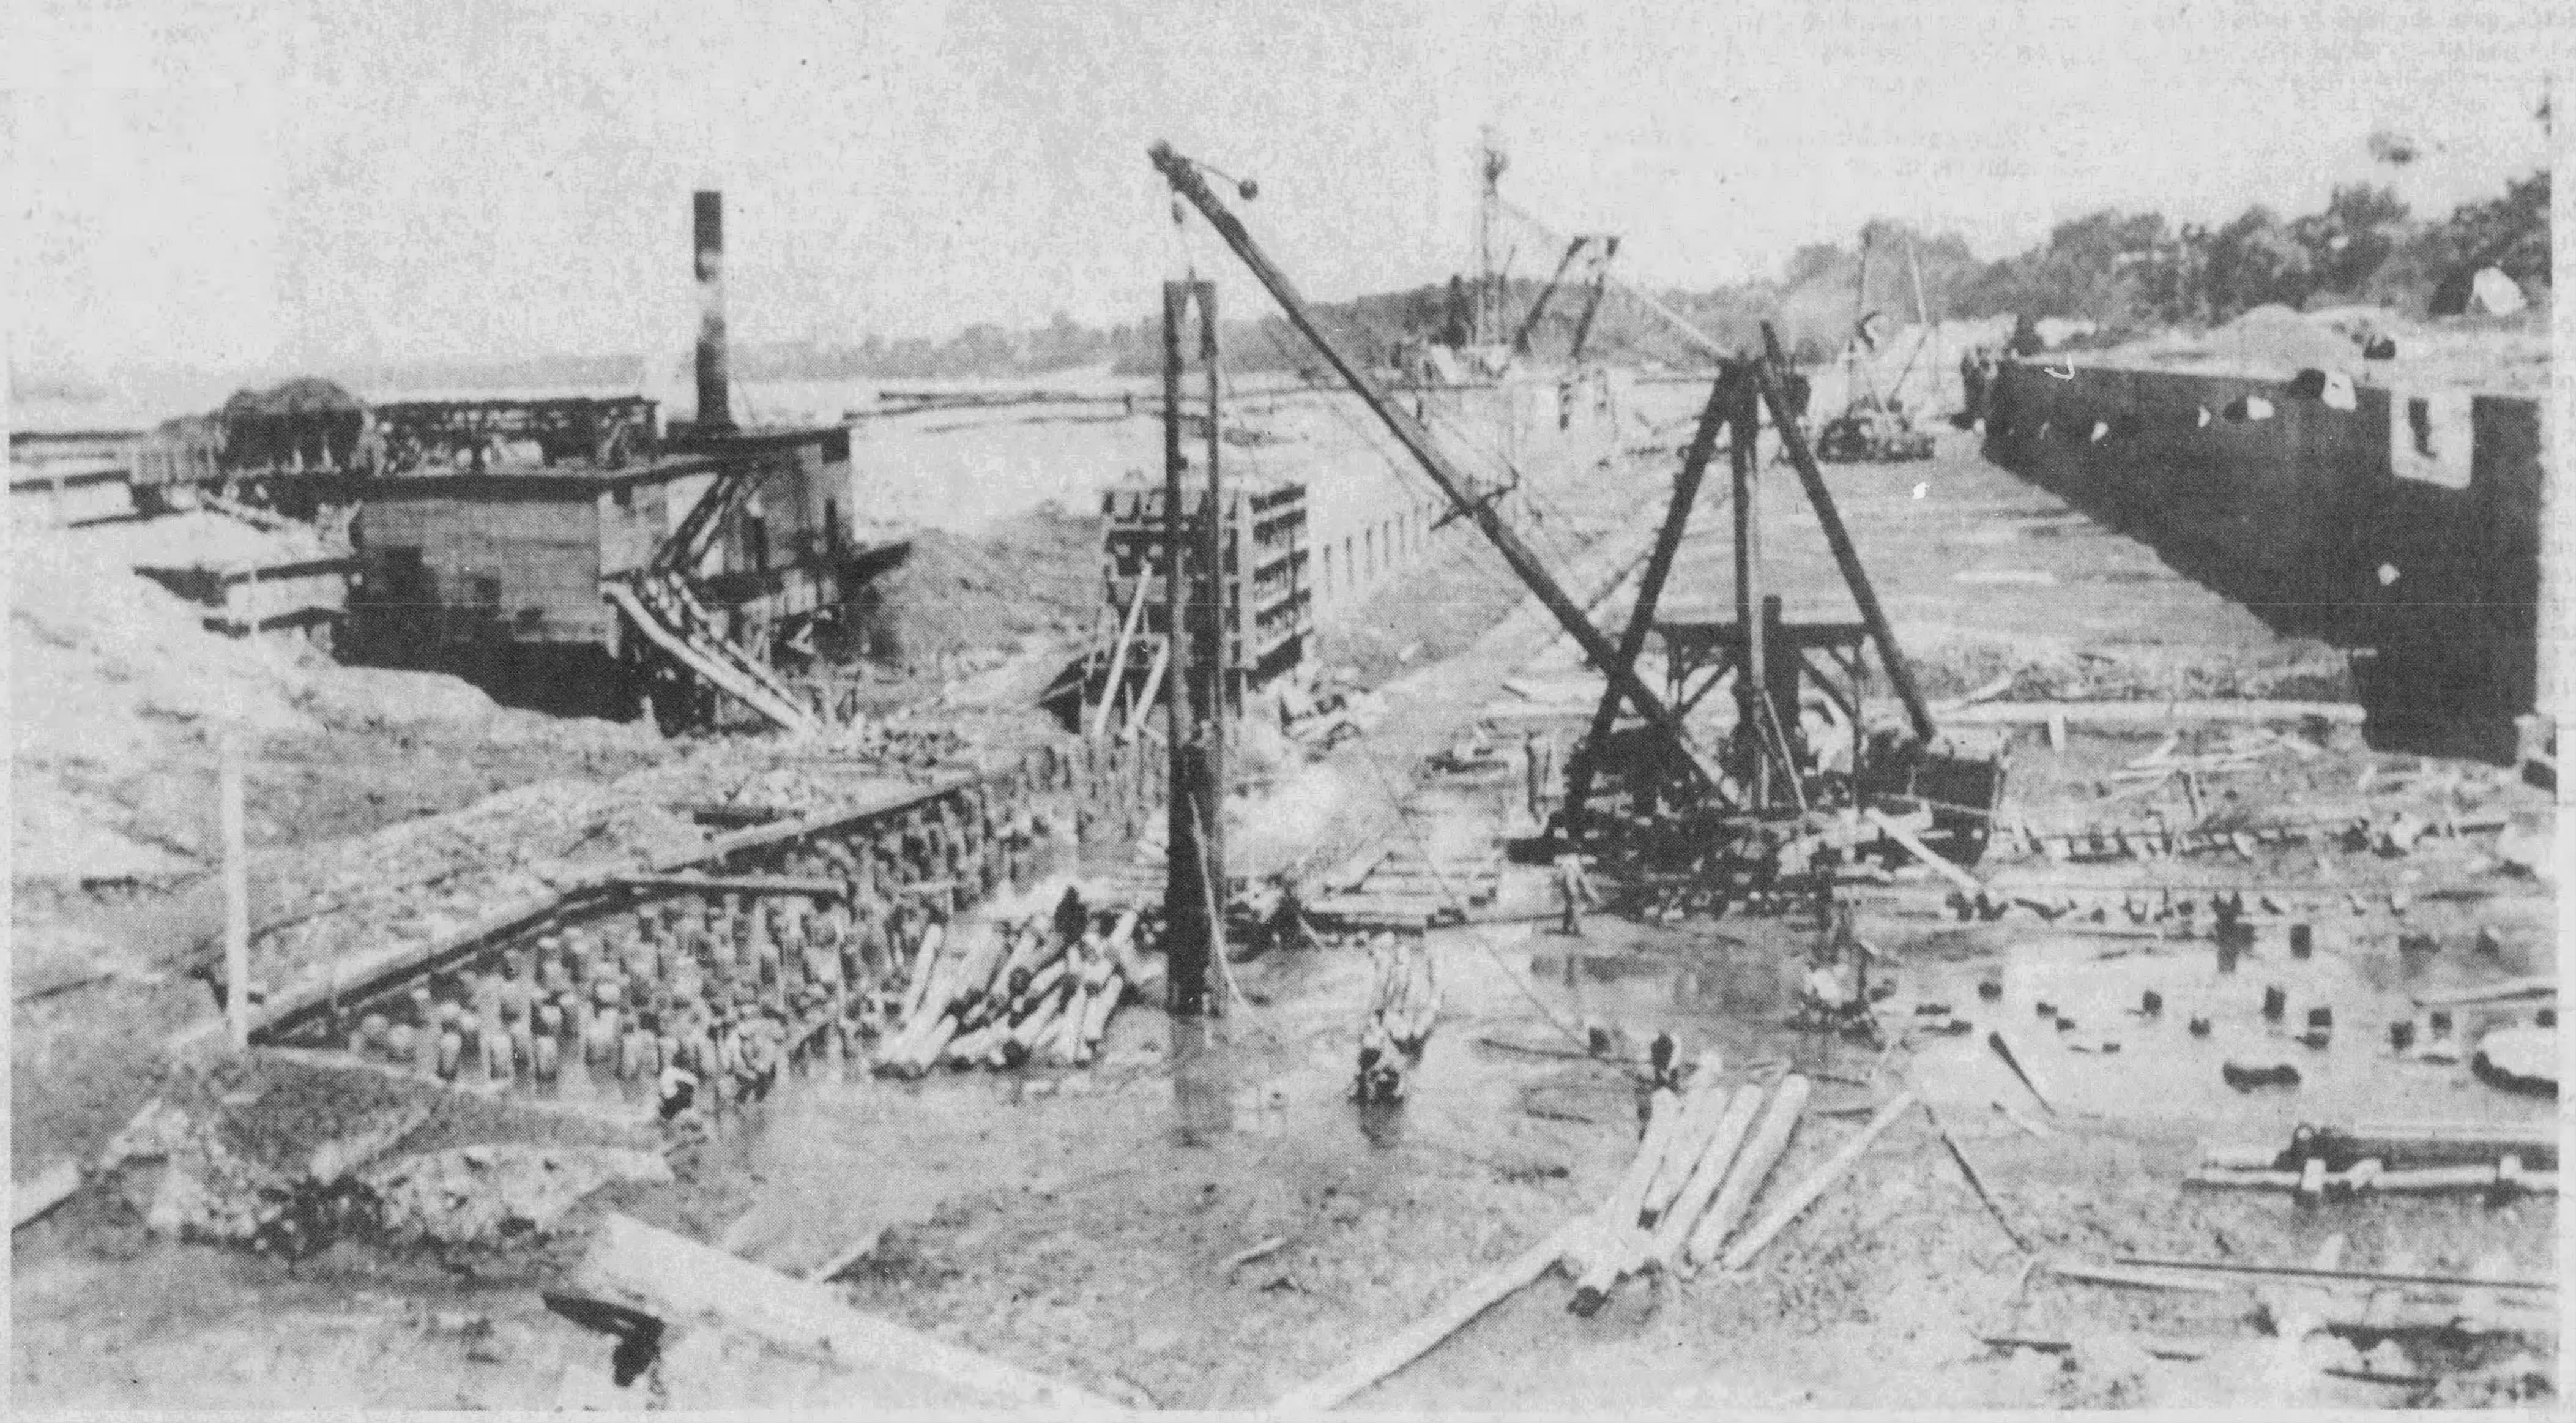 Construction work on the locks, 1923-1928